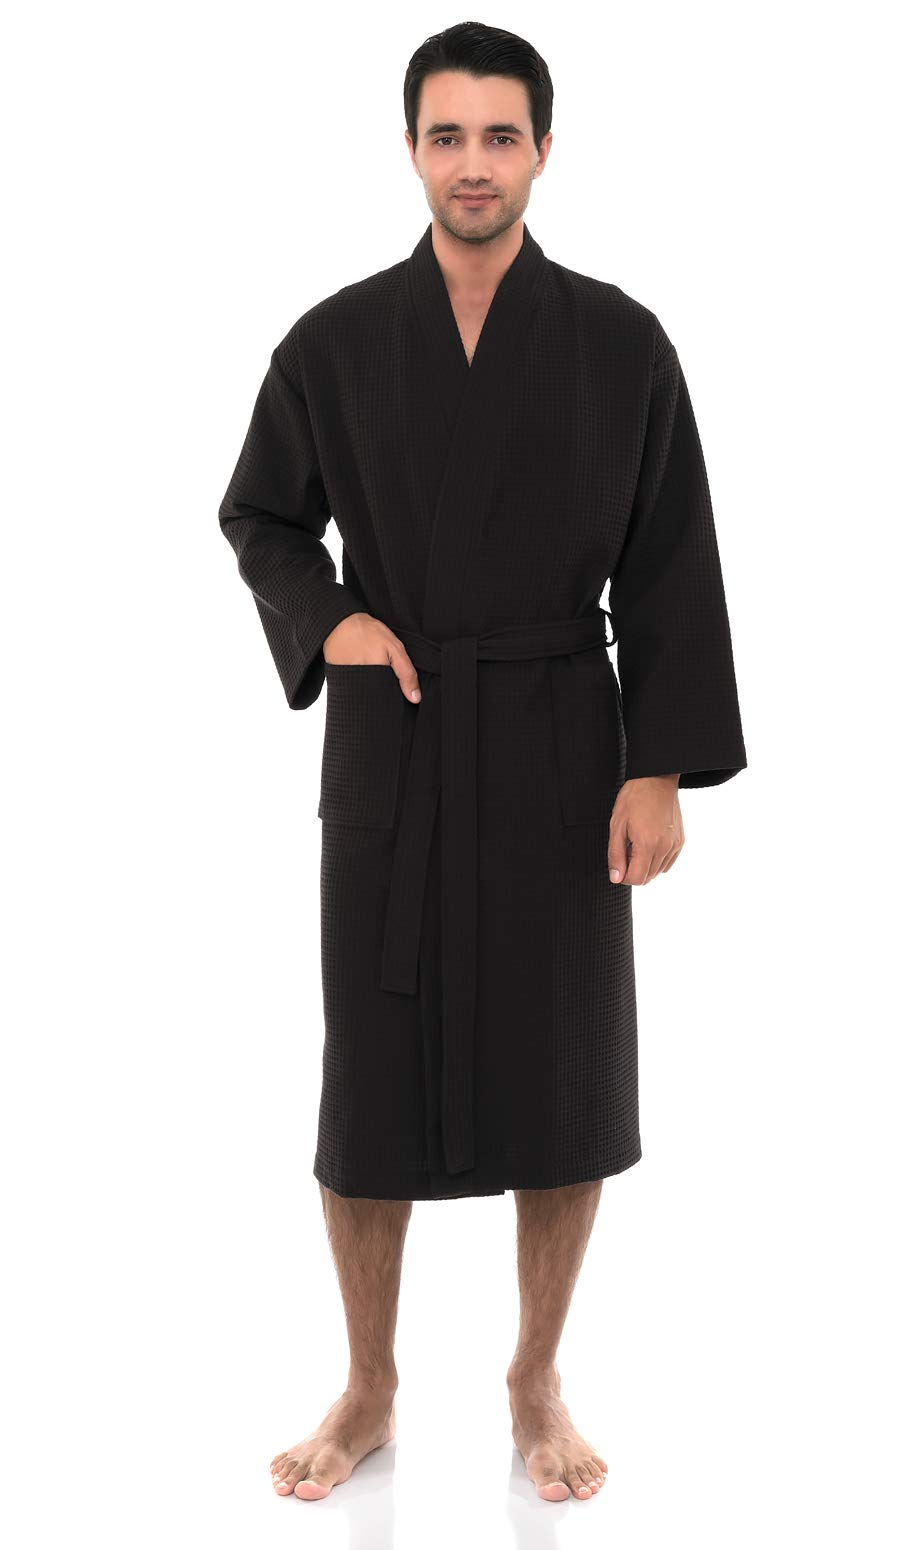 TowelSelections Men's Waffle Bathrobe Turkish Cotton Kimono Robe X-Small/Small Jet Black